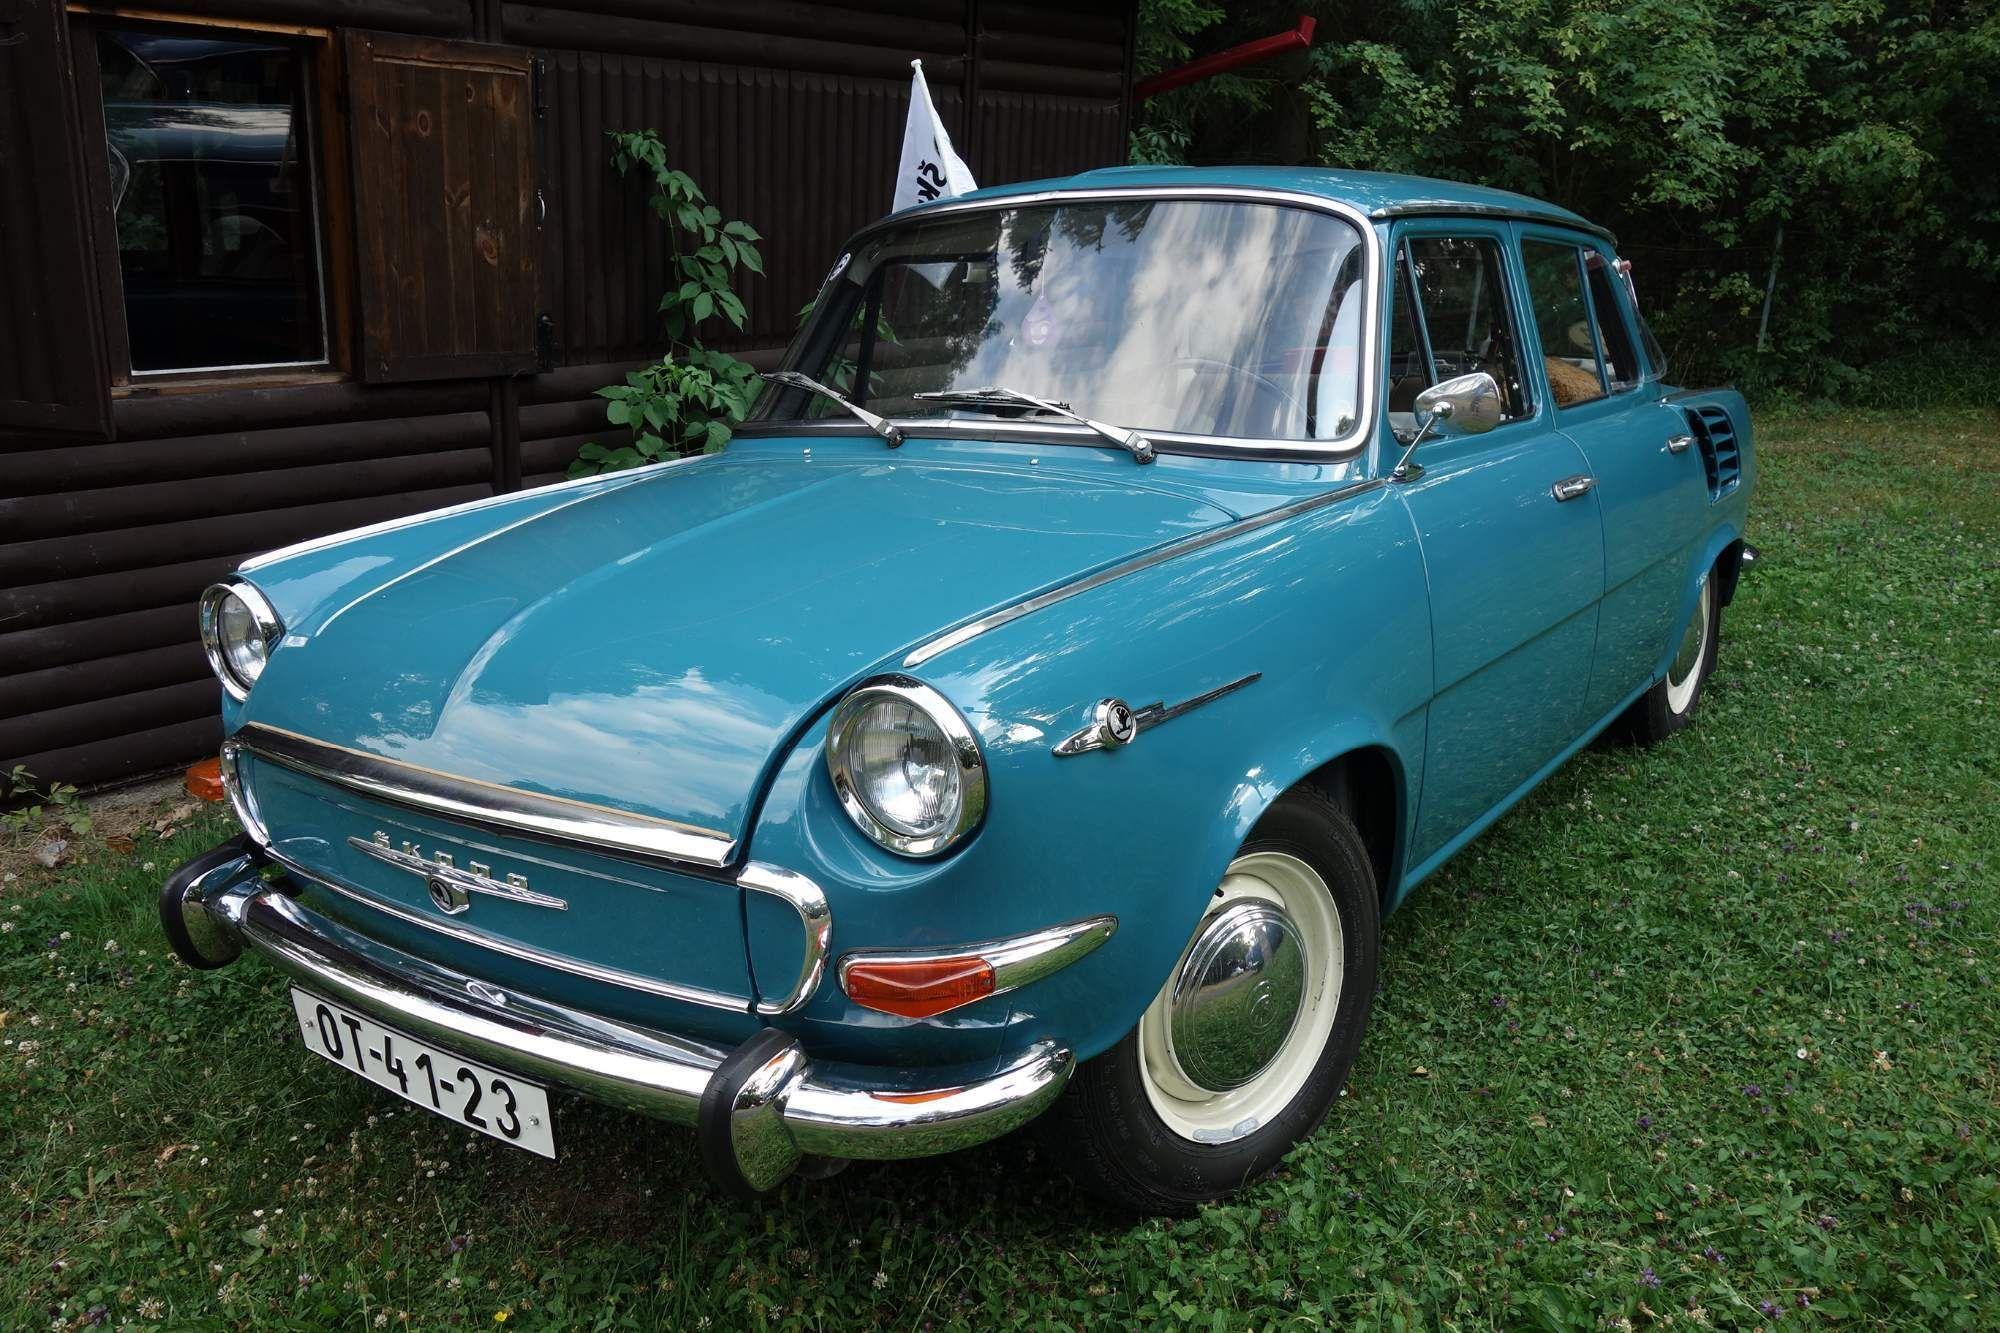 skoda 1000 mb czechoslovak classic cars pinterest cars. Black Bedroom Furniture Sets. Home Design Ideas